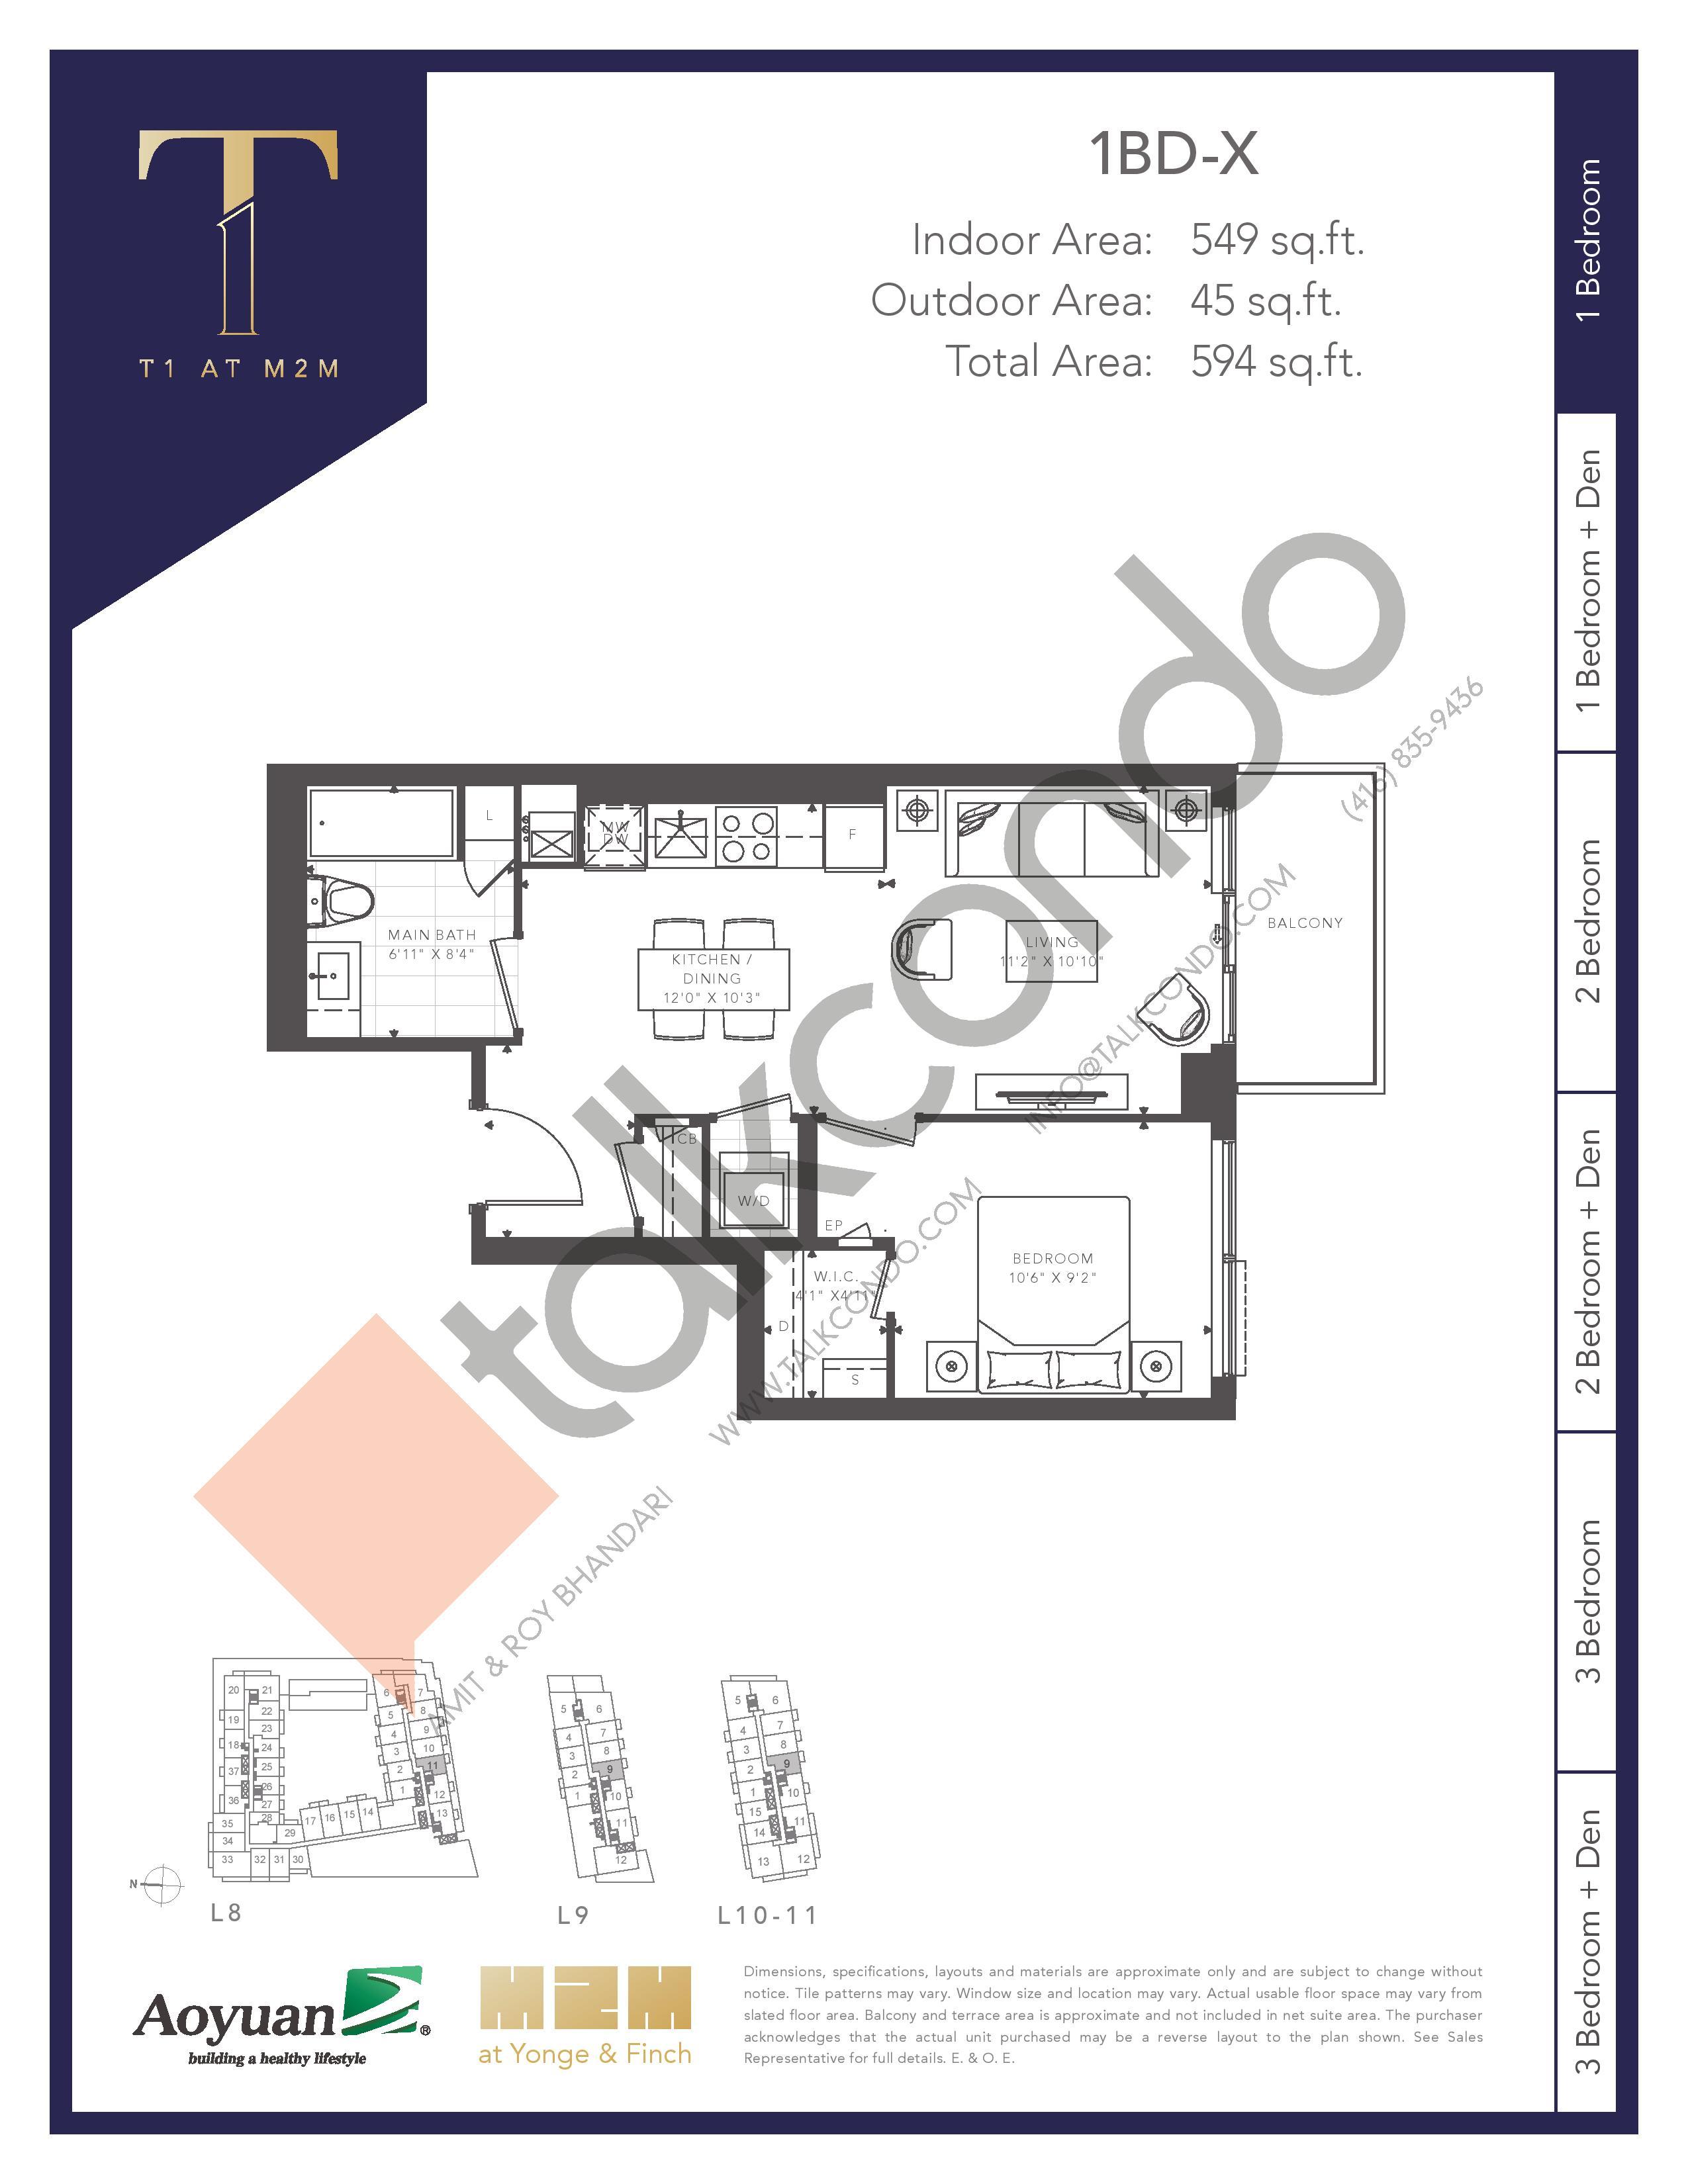 1BD-X (Tower) Floor Plan at T1 at M2M Condos - 549 sq.ft